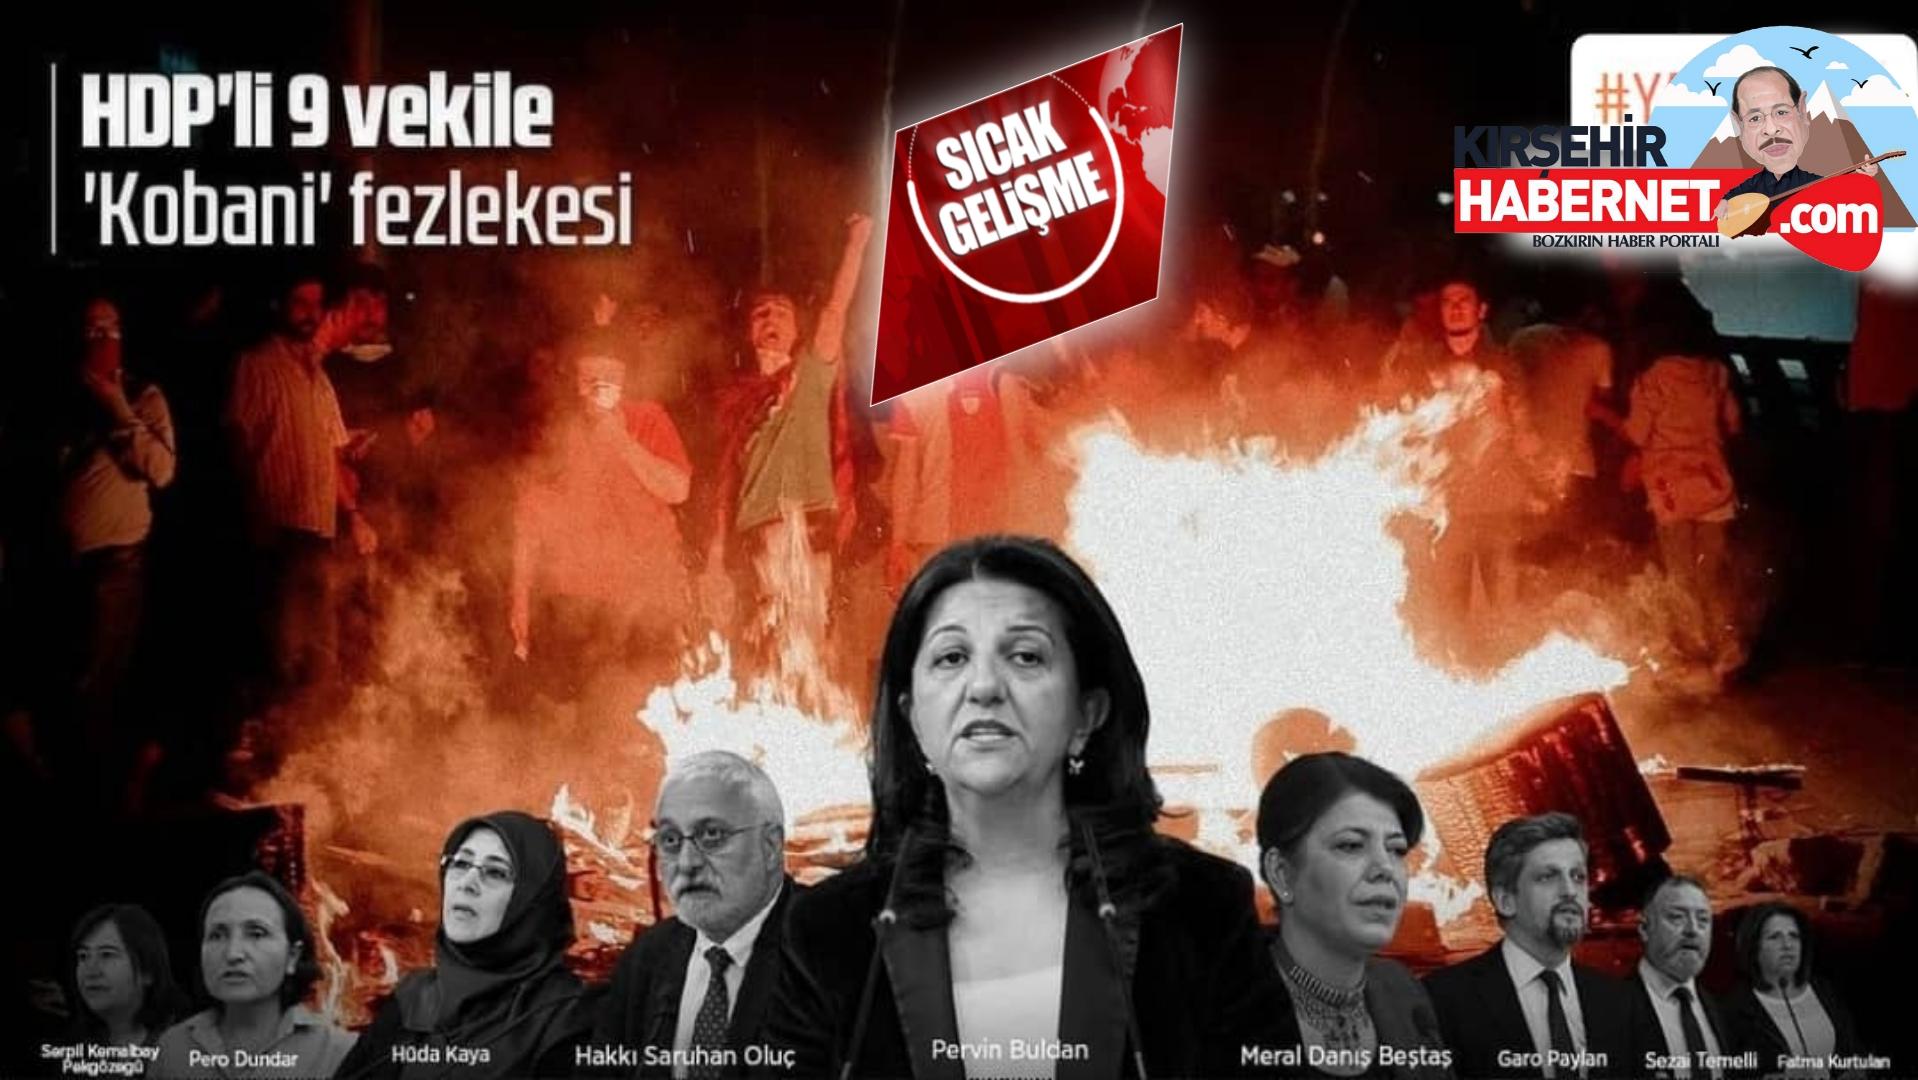 9 HDP' li VEKİLE FEZLEKE HAZIRLANDI !!